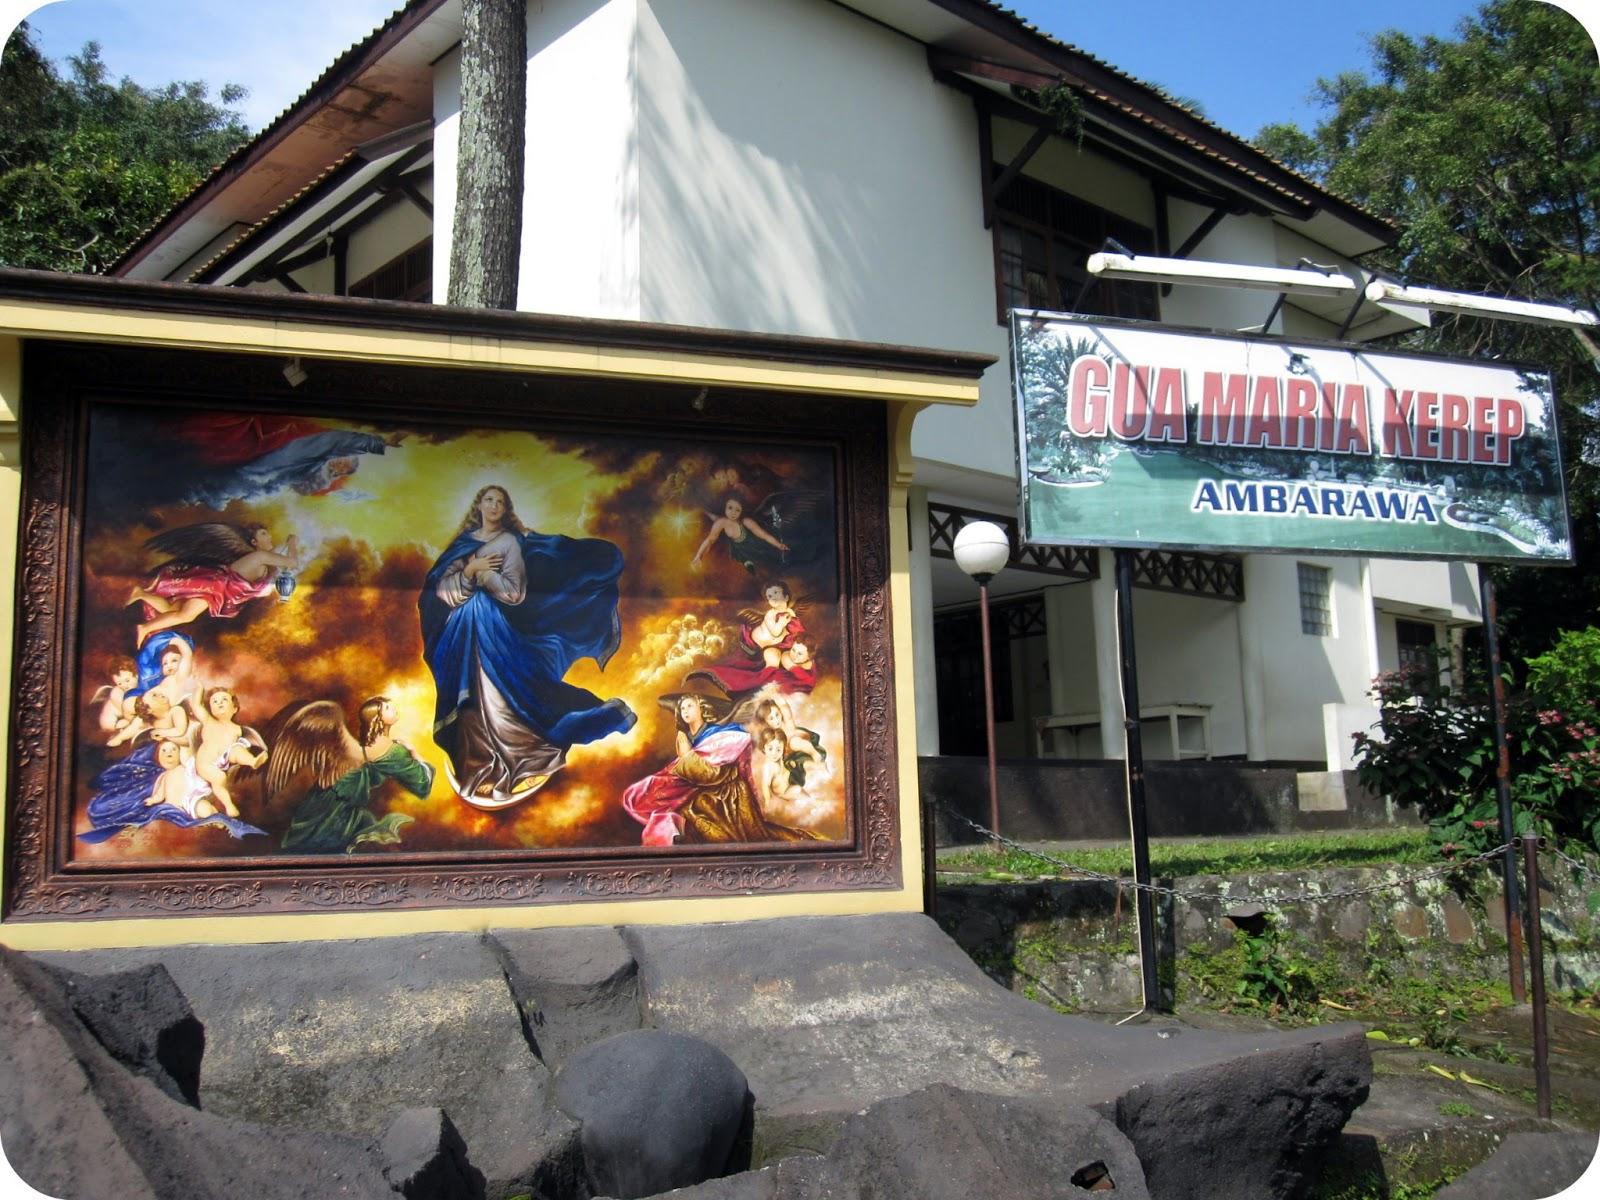 Gua Maria Kerep Ambarawa Paket Wisata Religi Gmka Dikenal Bukanlah